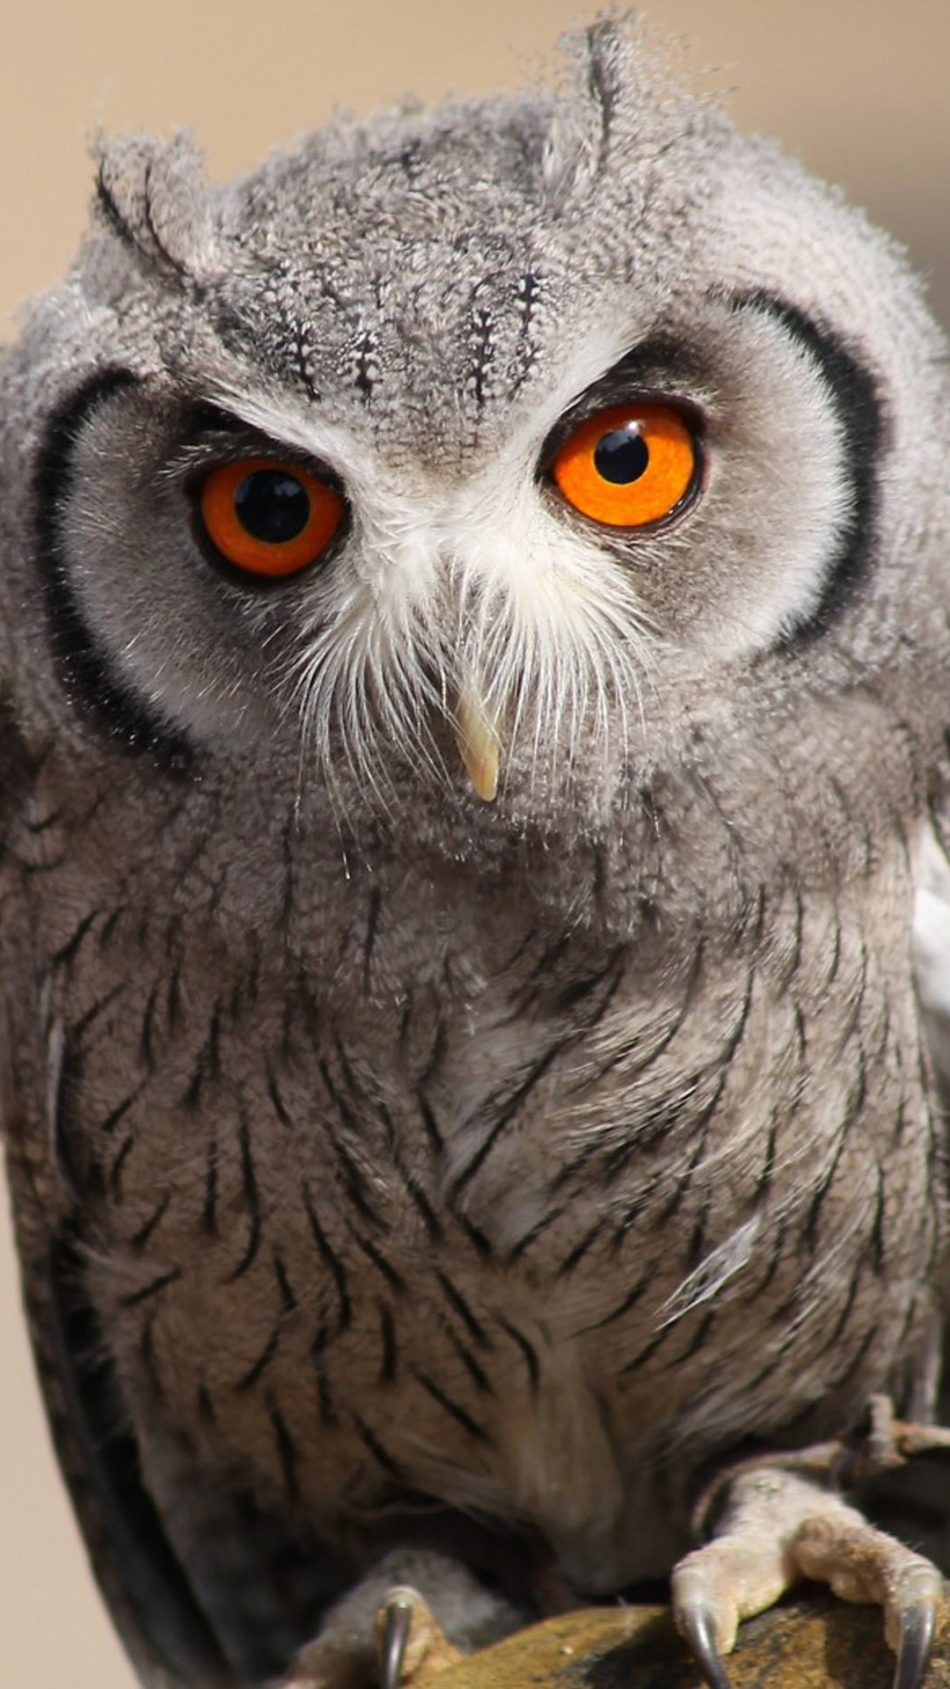 Staring Owl Free 4k Ultra Hd Mobile Wallpaper